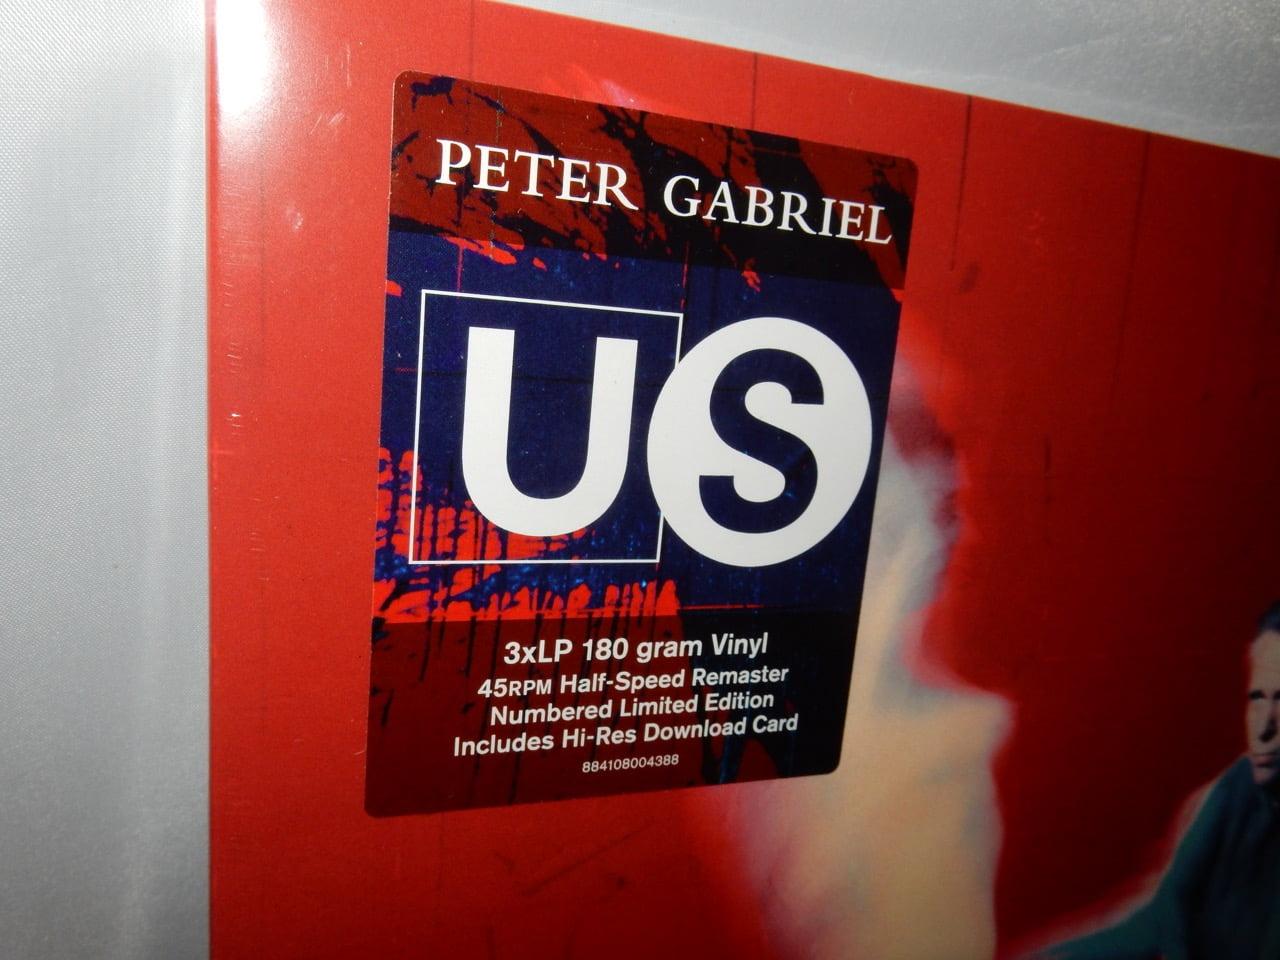 "Peter Gabriel ""Us"" 3XLP Vinyl Limited Edition Numbered Gatefold"